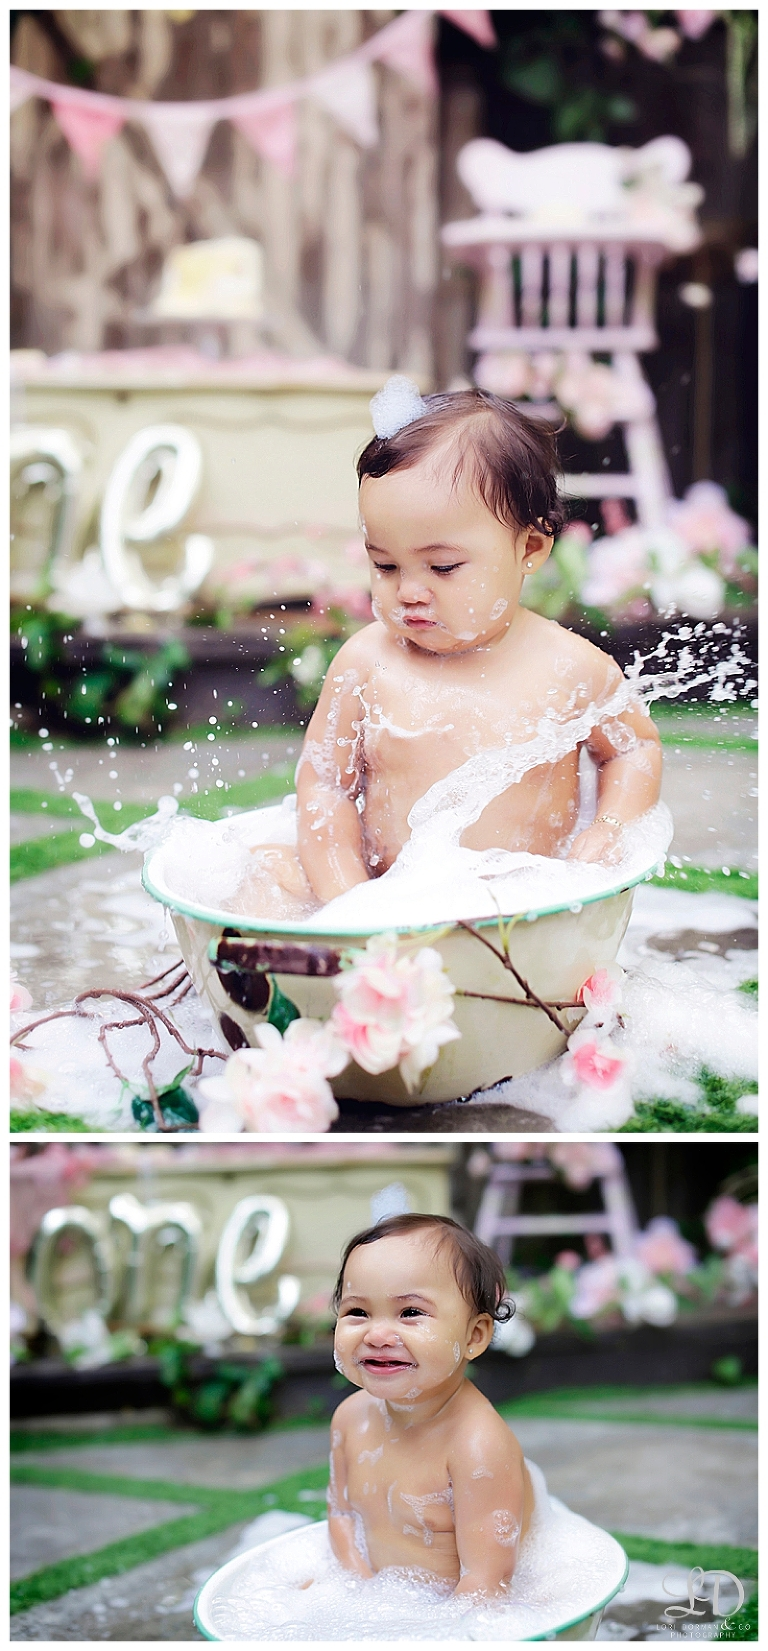 sweet maternity photoshoot-lori dorman photography-maternity boudoir-professional photographer_4411.jpg